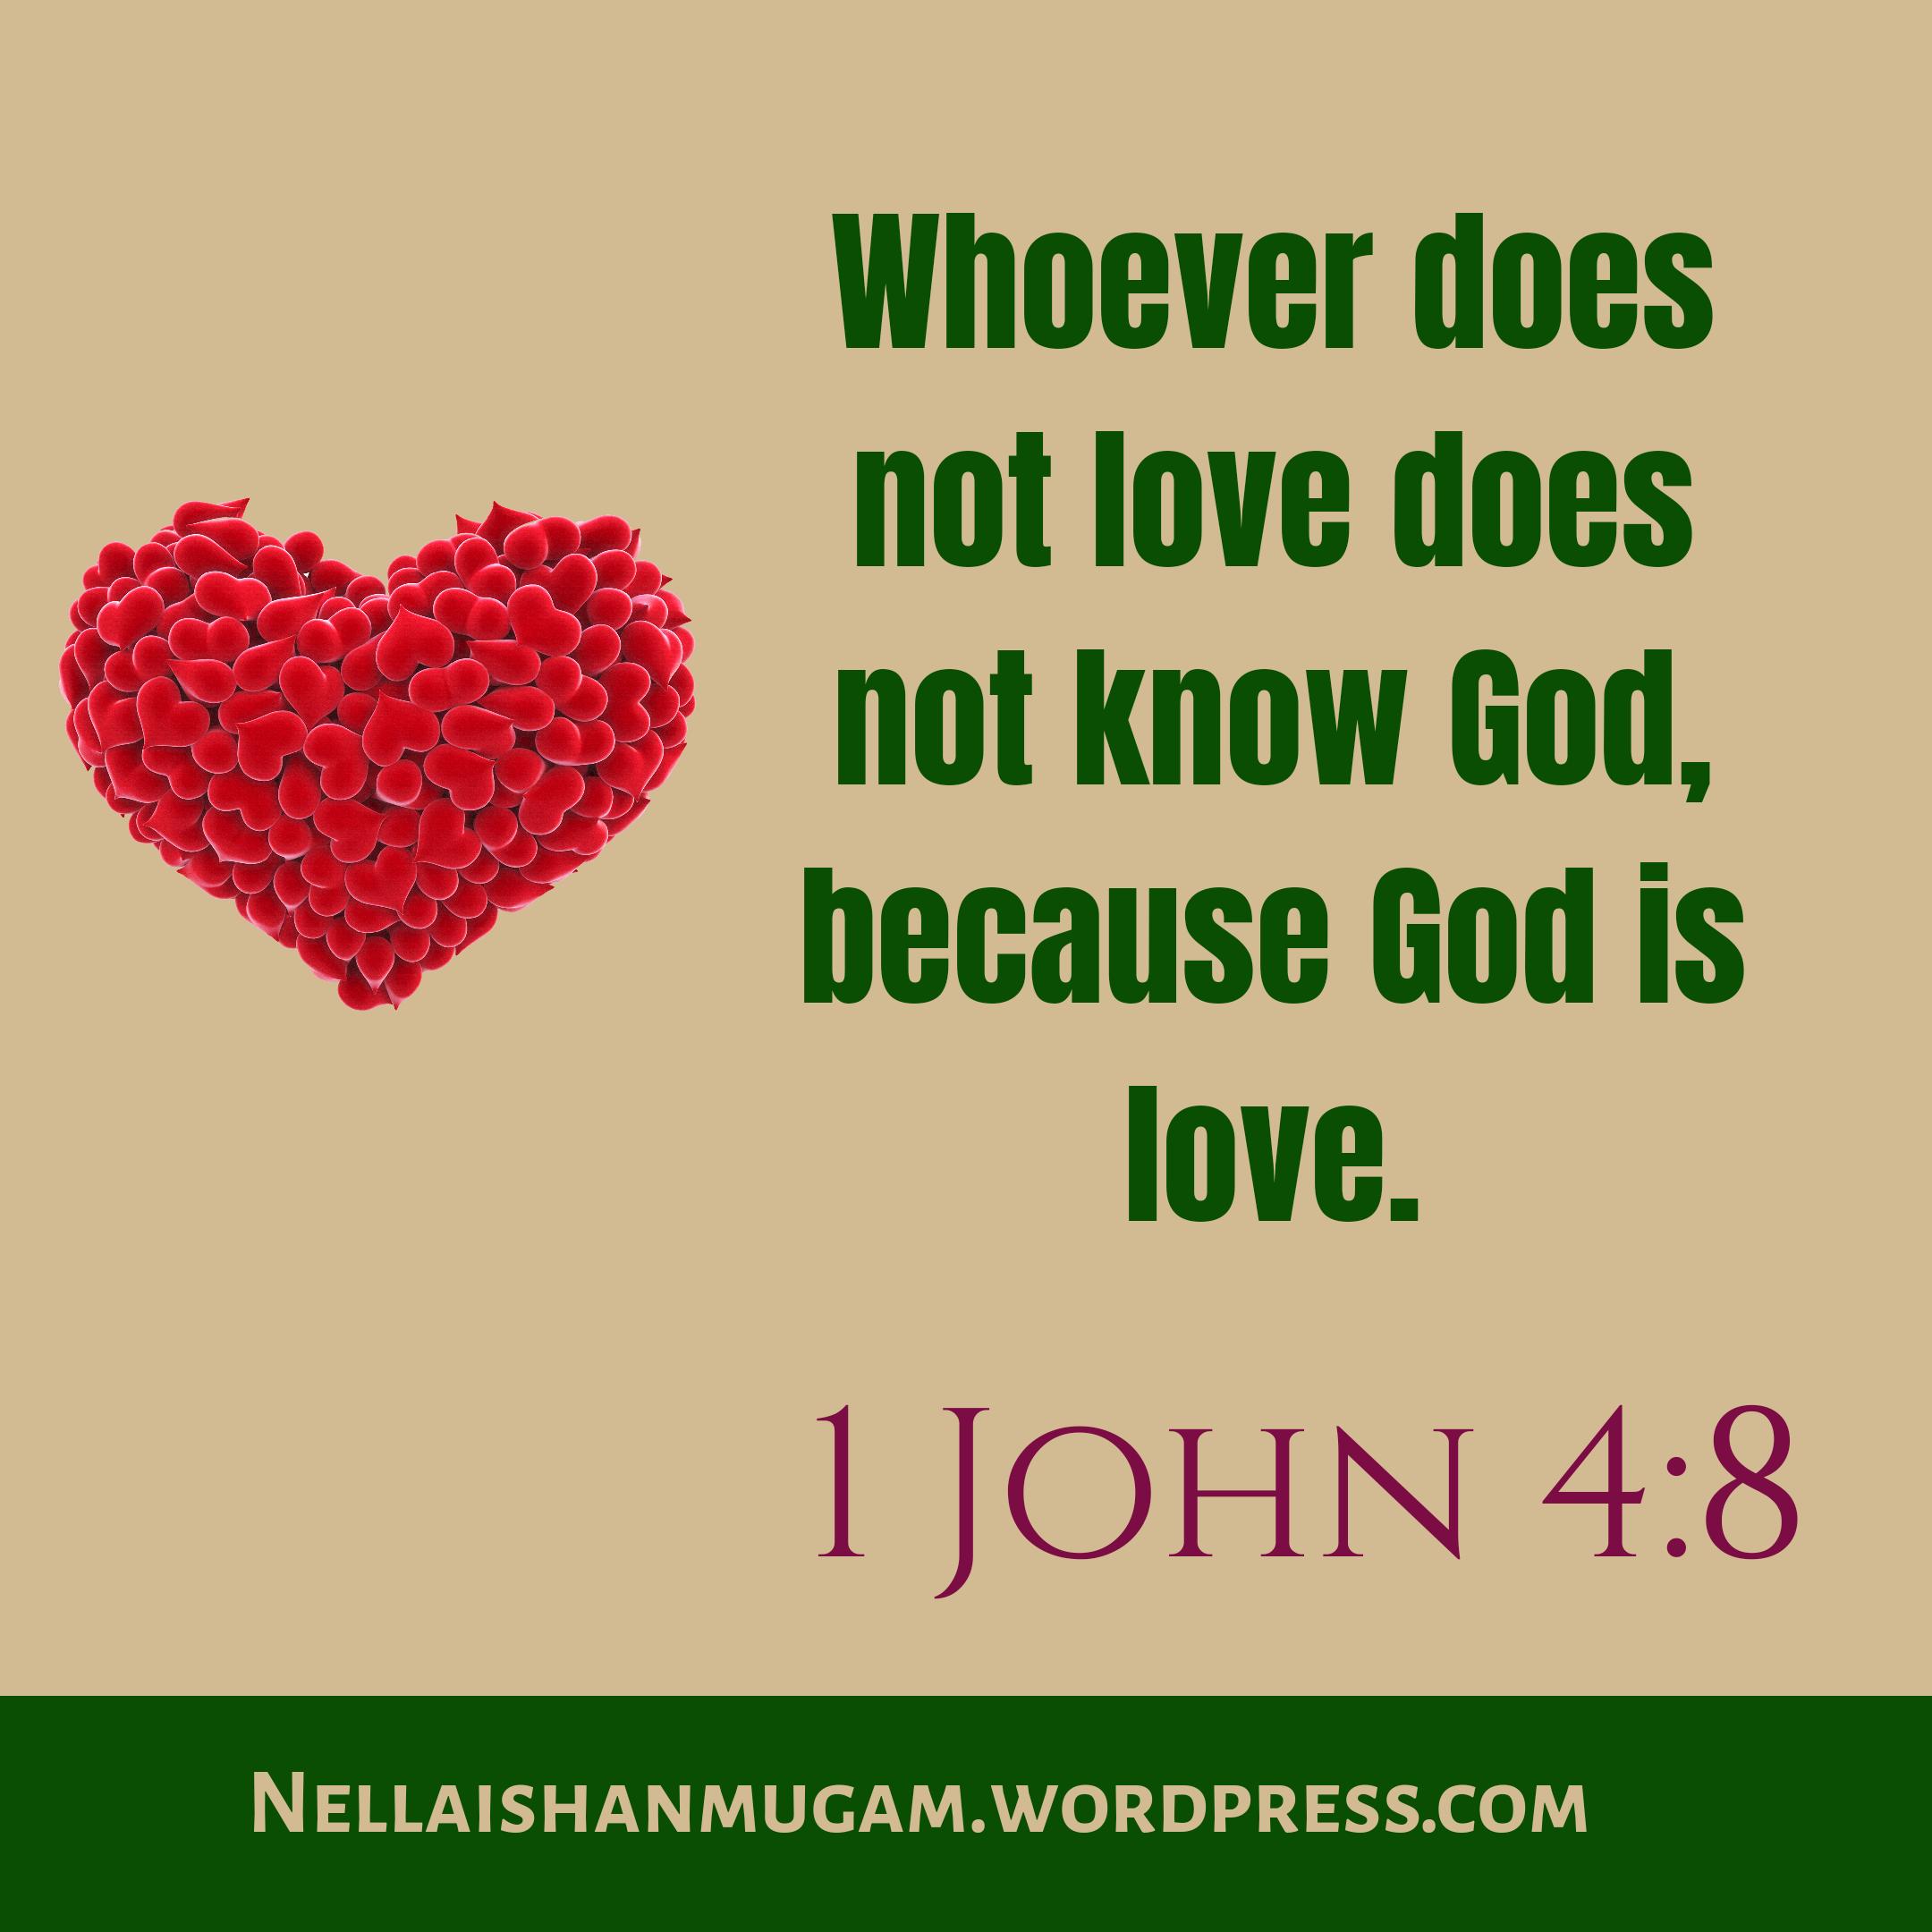 Bible verse regarding love - 1 John 4:8